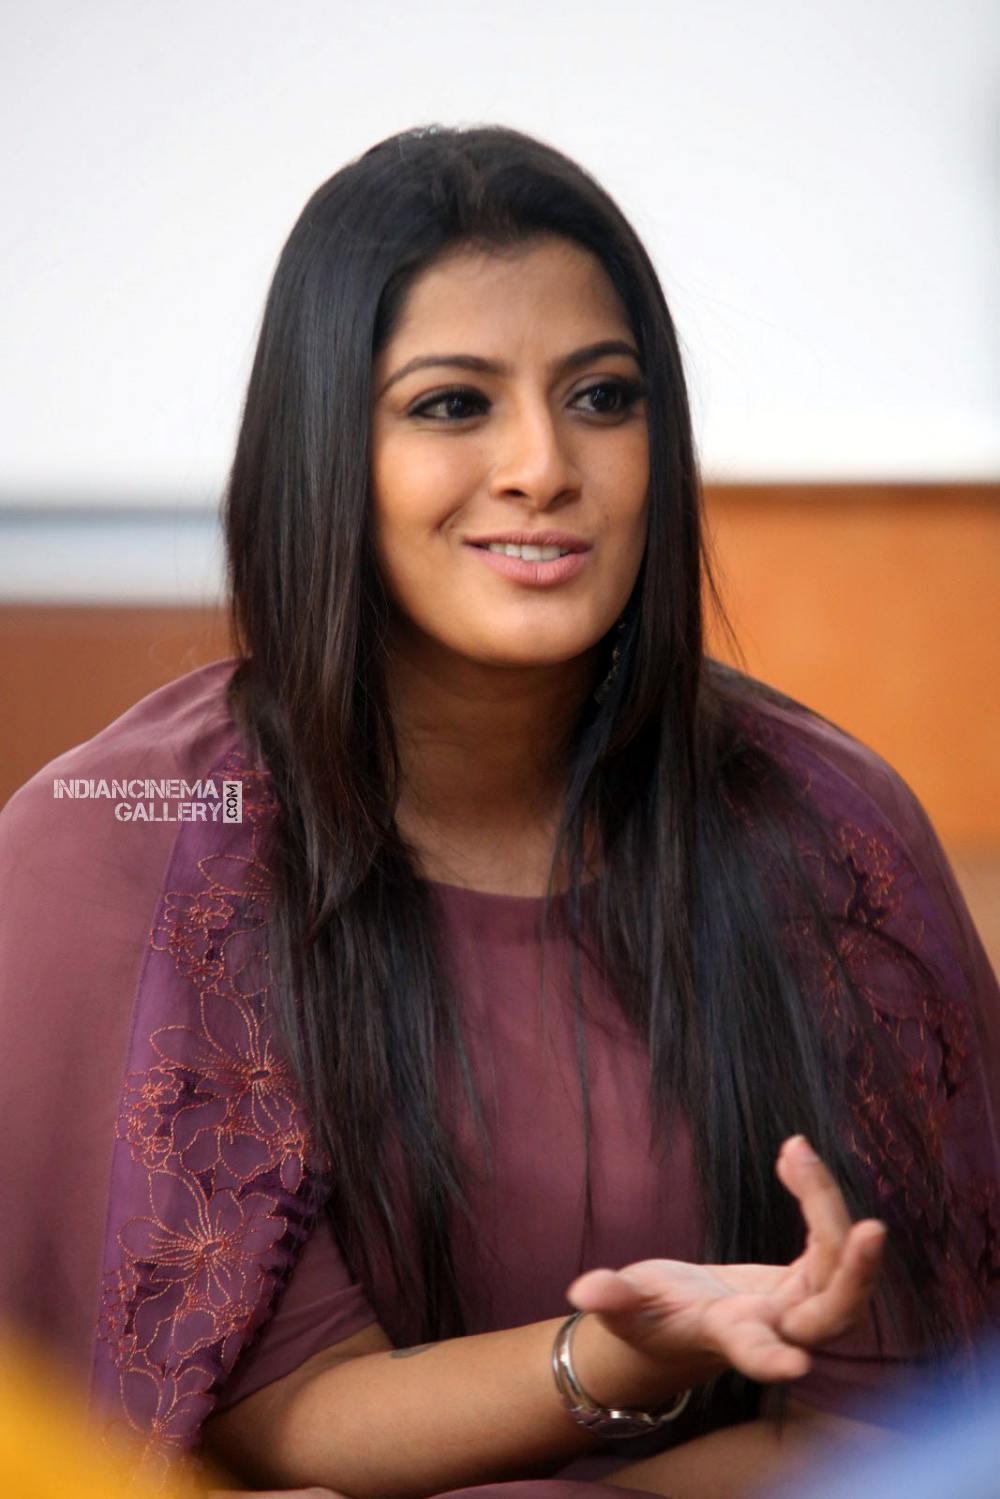 Varalakshmi sarathkumar during interview stills (18)